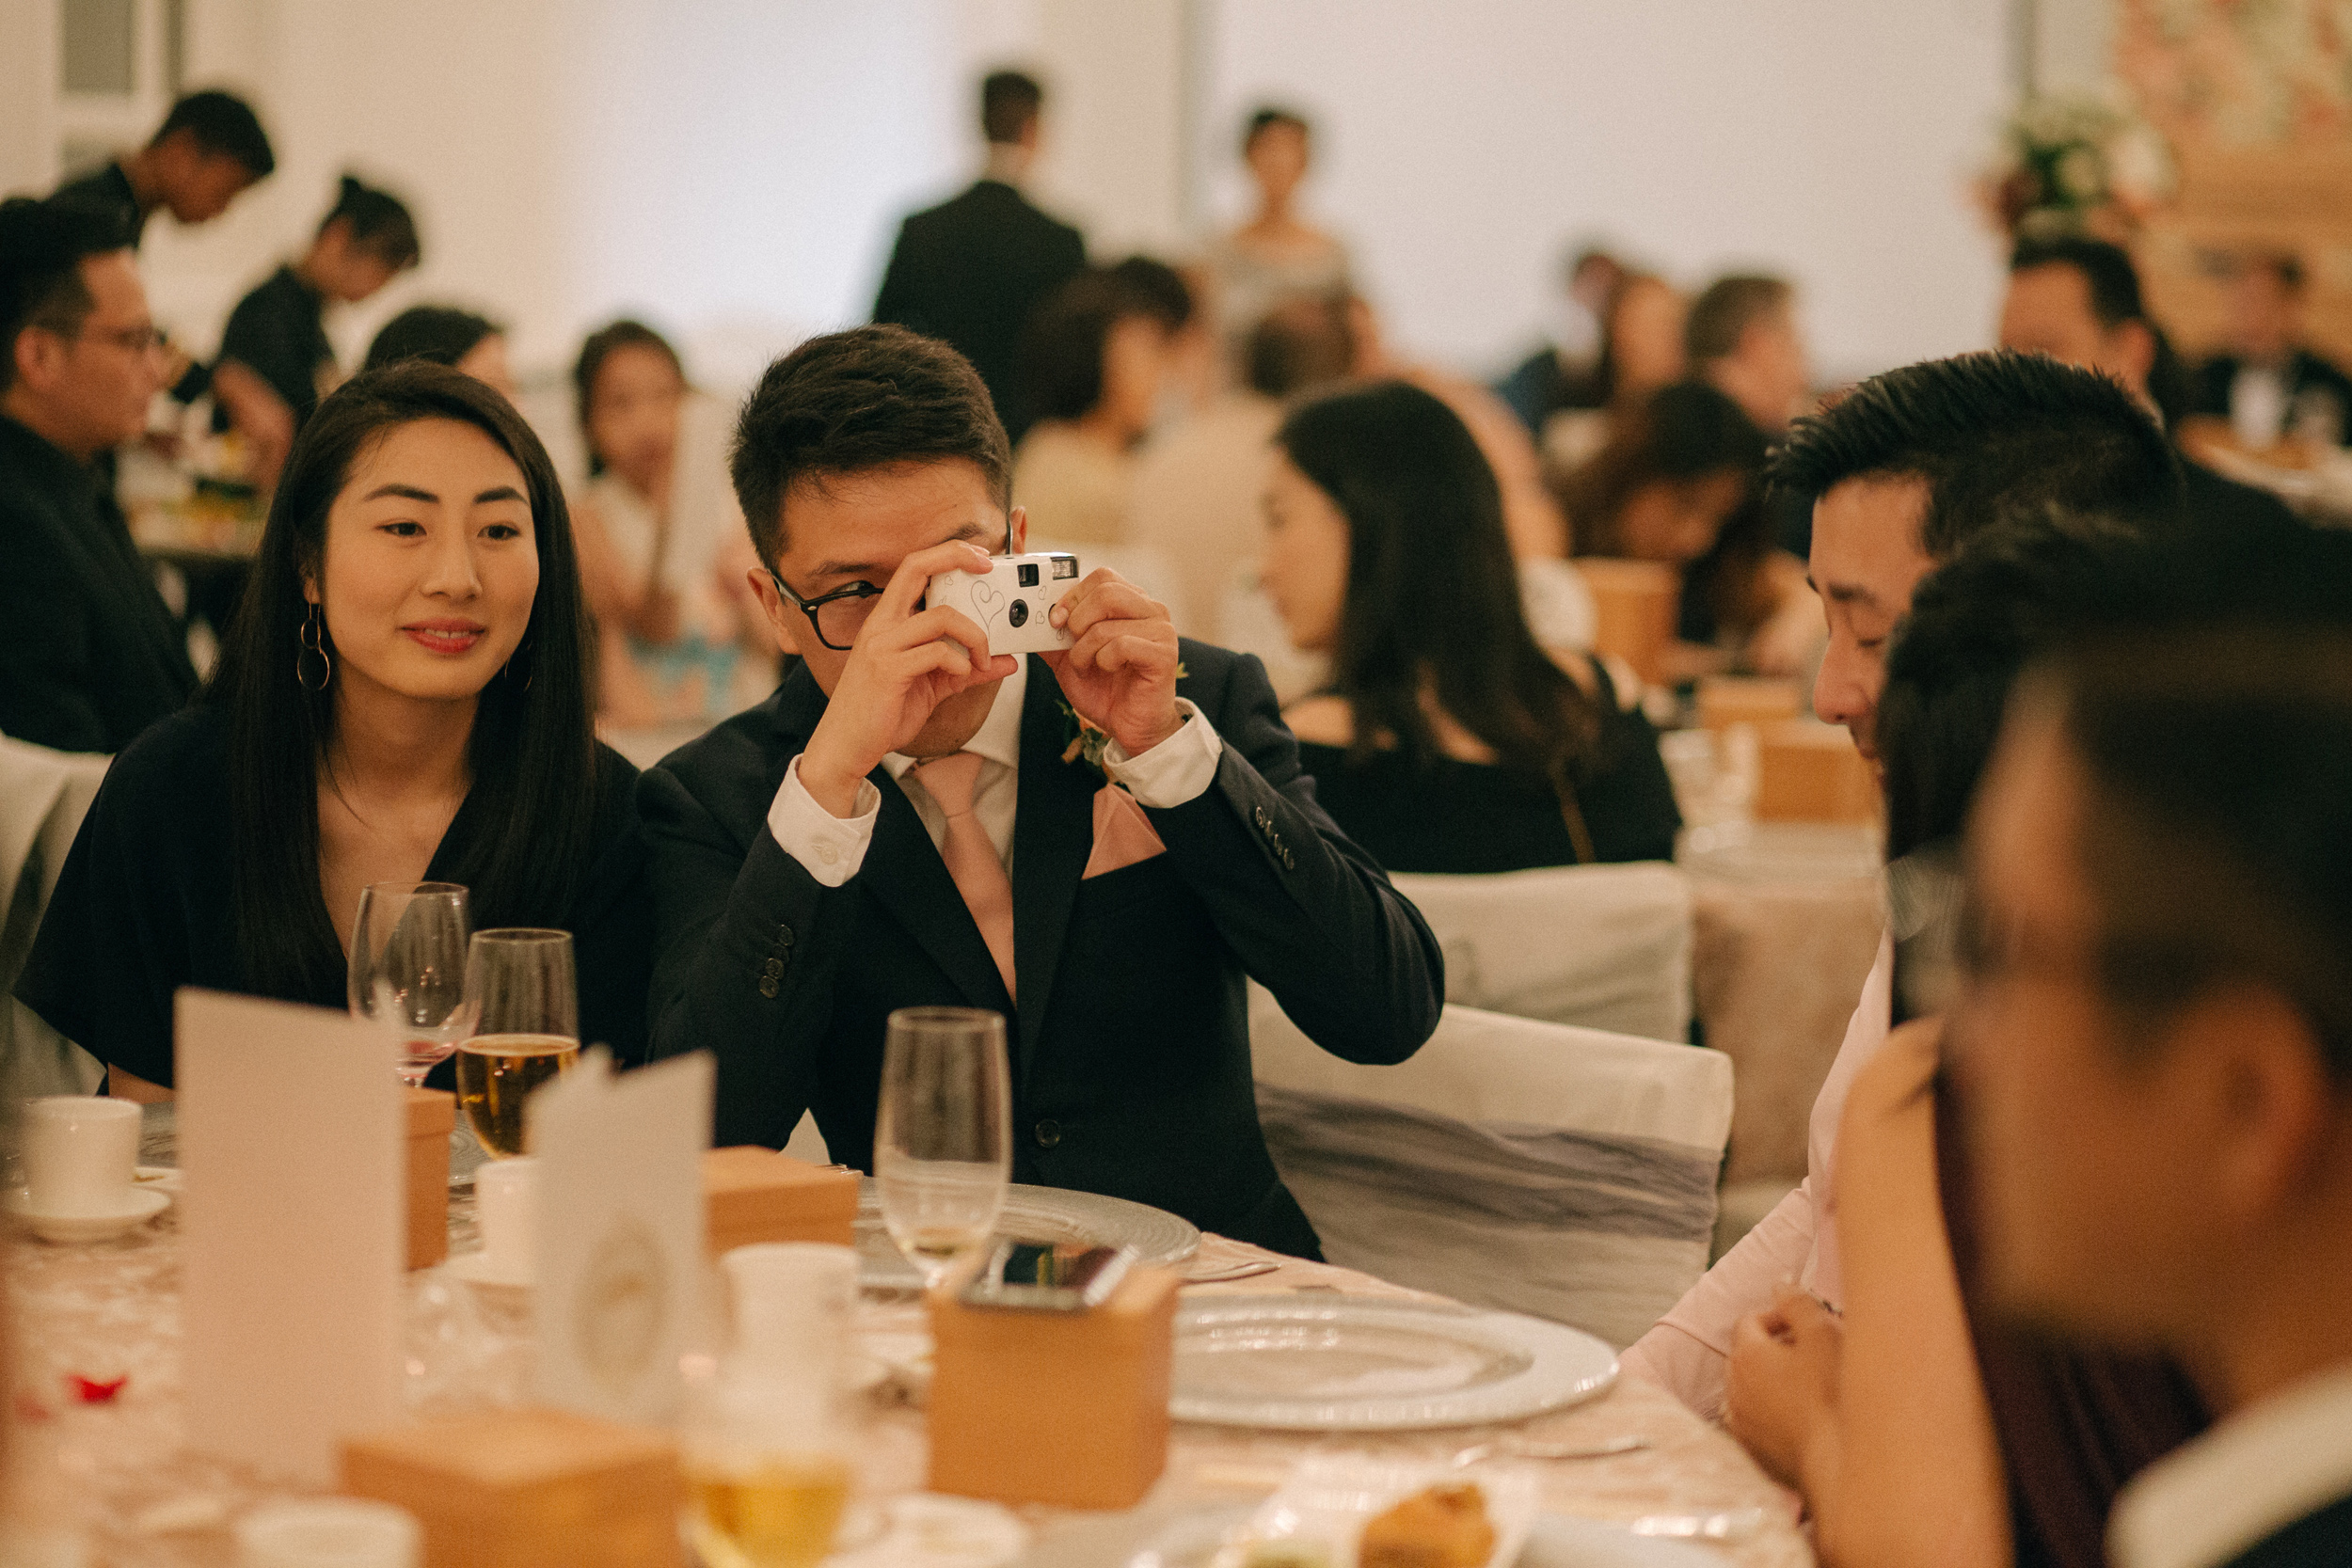 singapore-wedding-photographer-cheryl-matthew-fullerton-hotel-wedding-64.jpg